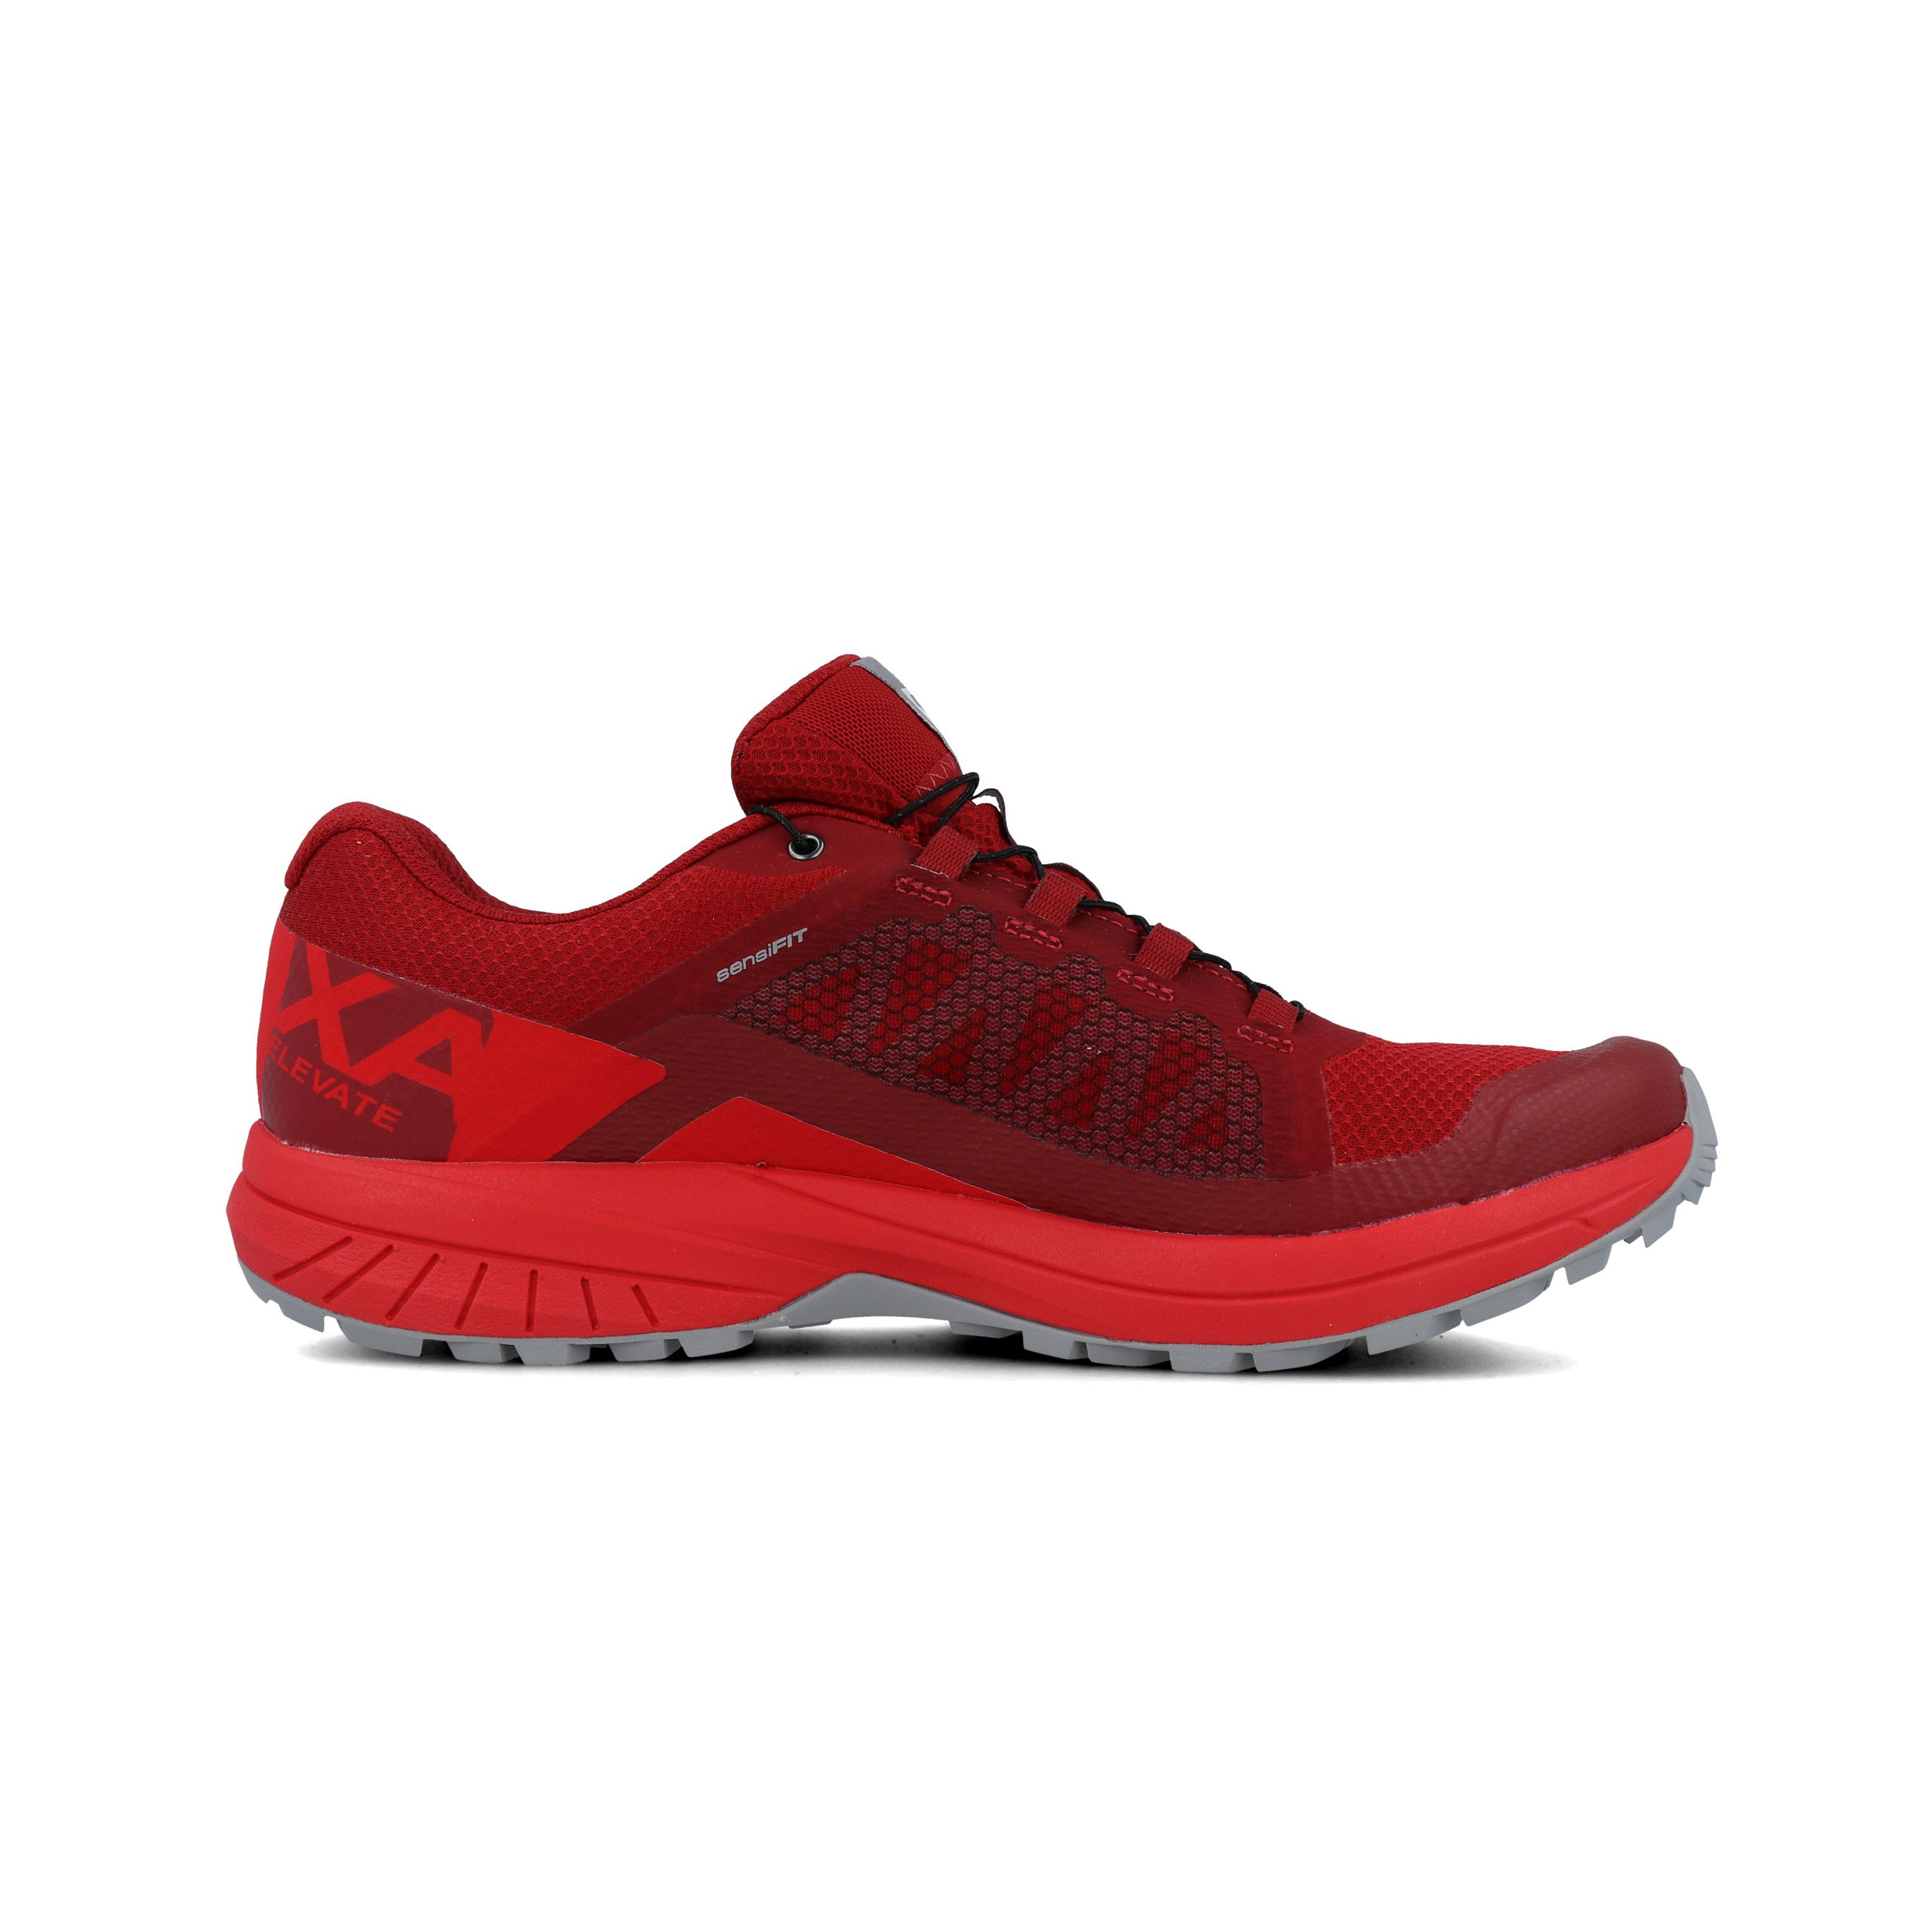 3a511f8ddd6 Salomon Hommes Xa Elevate Gore-Tex Trail Chaussures Course À Pied Baskets  Rouge